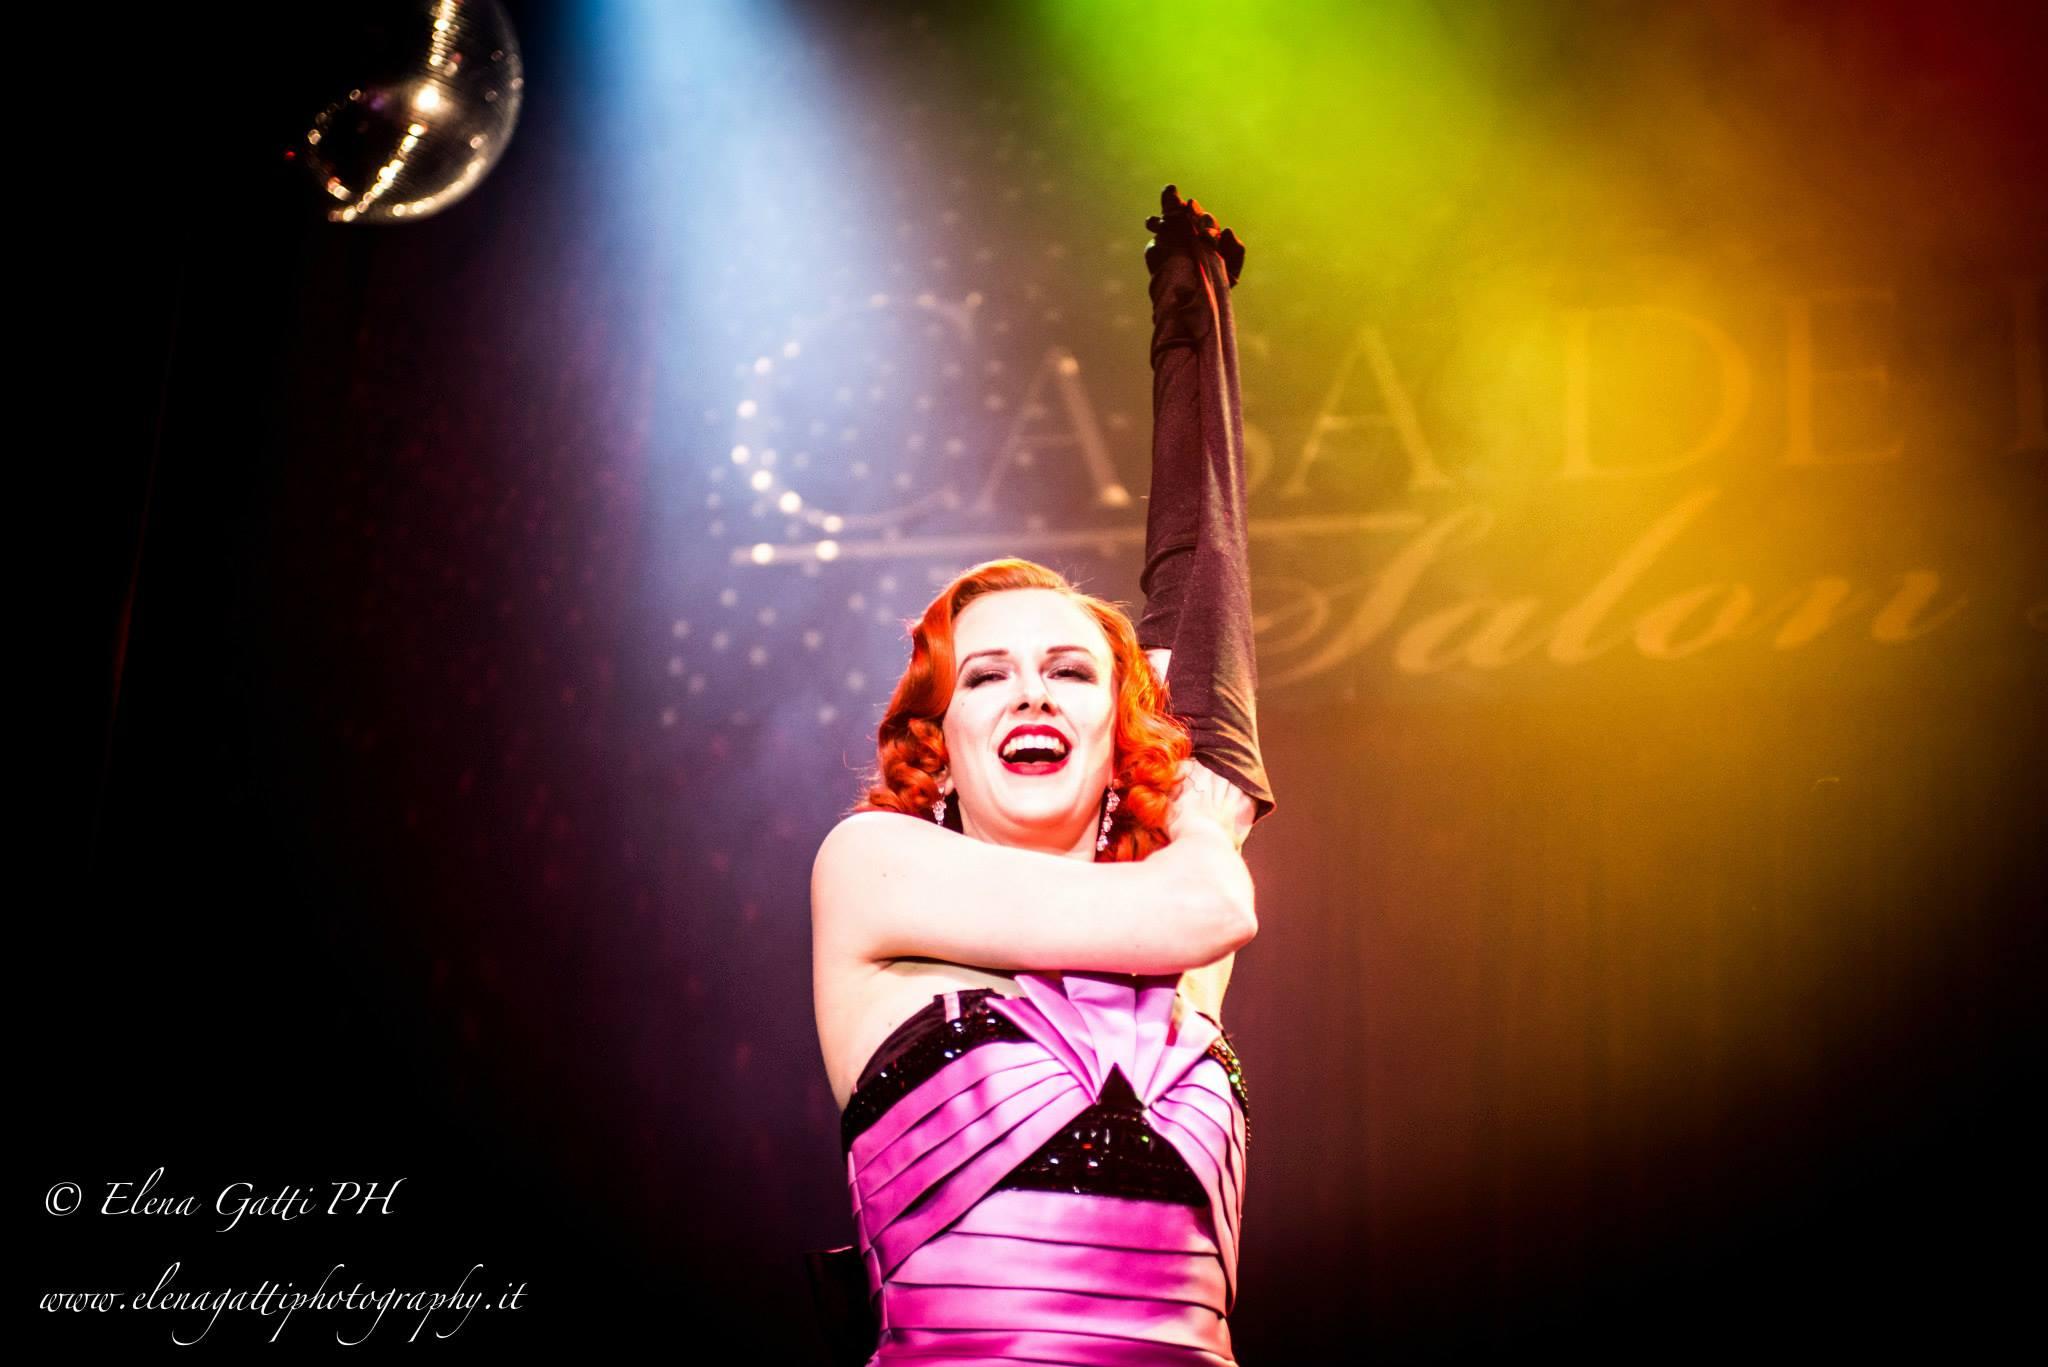 Bettina-May-Royal-Burlesque-Revue-22.02.14-Photo-by-Elena-Gatti3